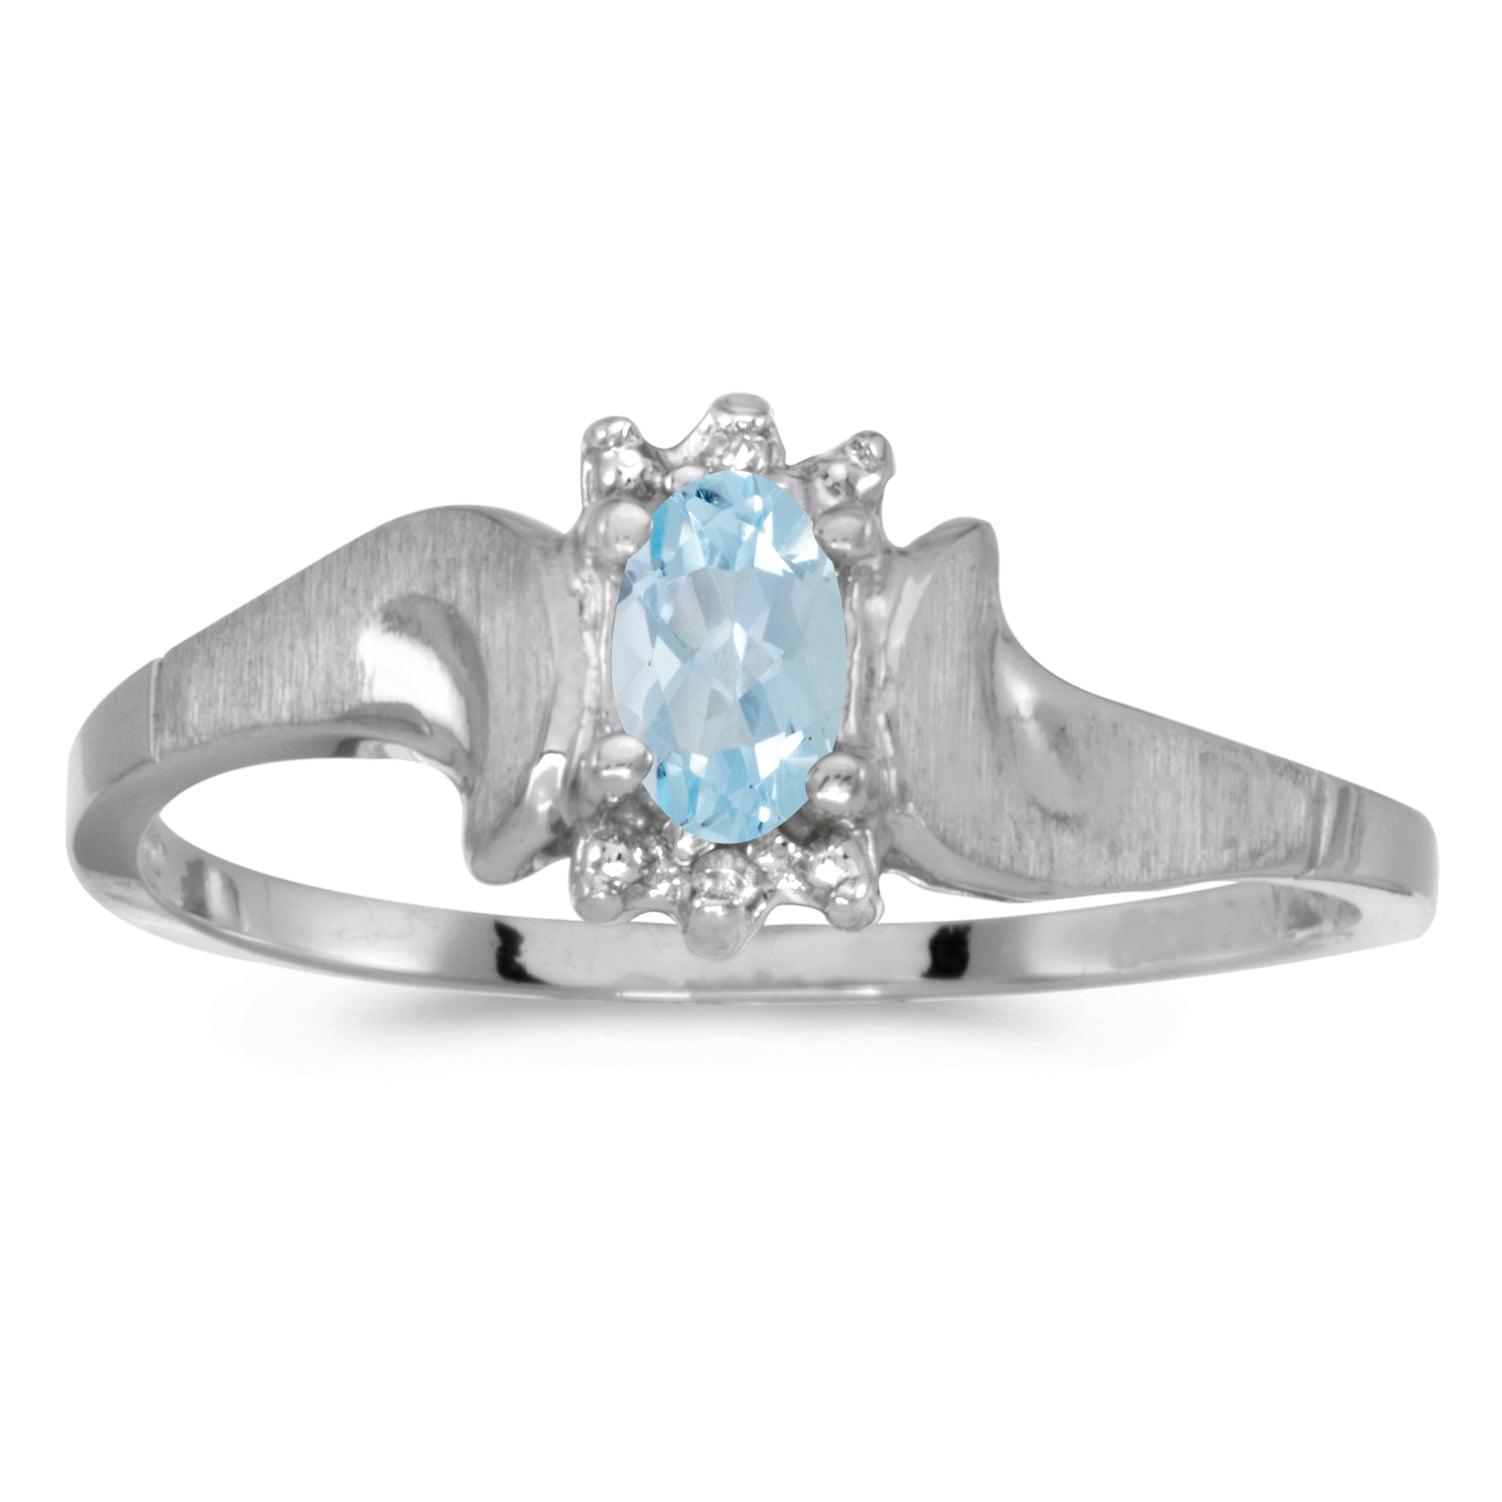 14k White Gold Oval Aquamarine And Diamond Satin Finish Ring by